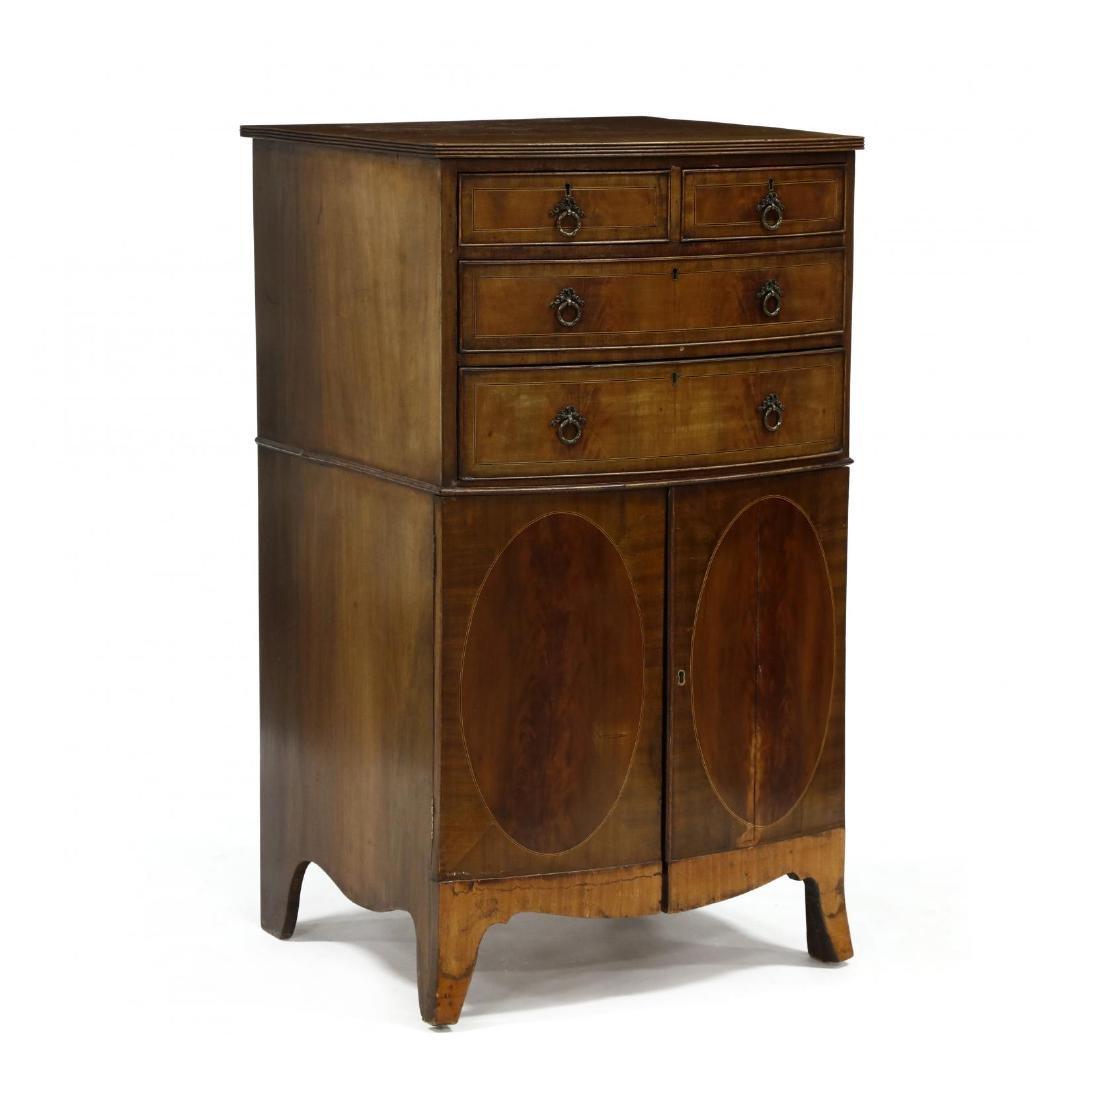 George III Mahogany Inlaid Dressing Cabinet